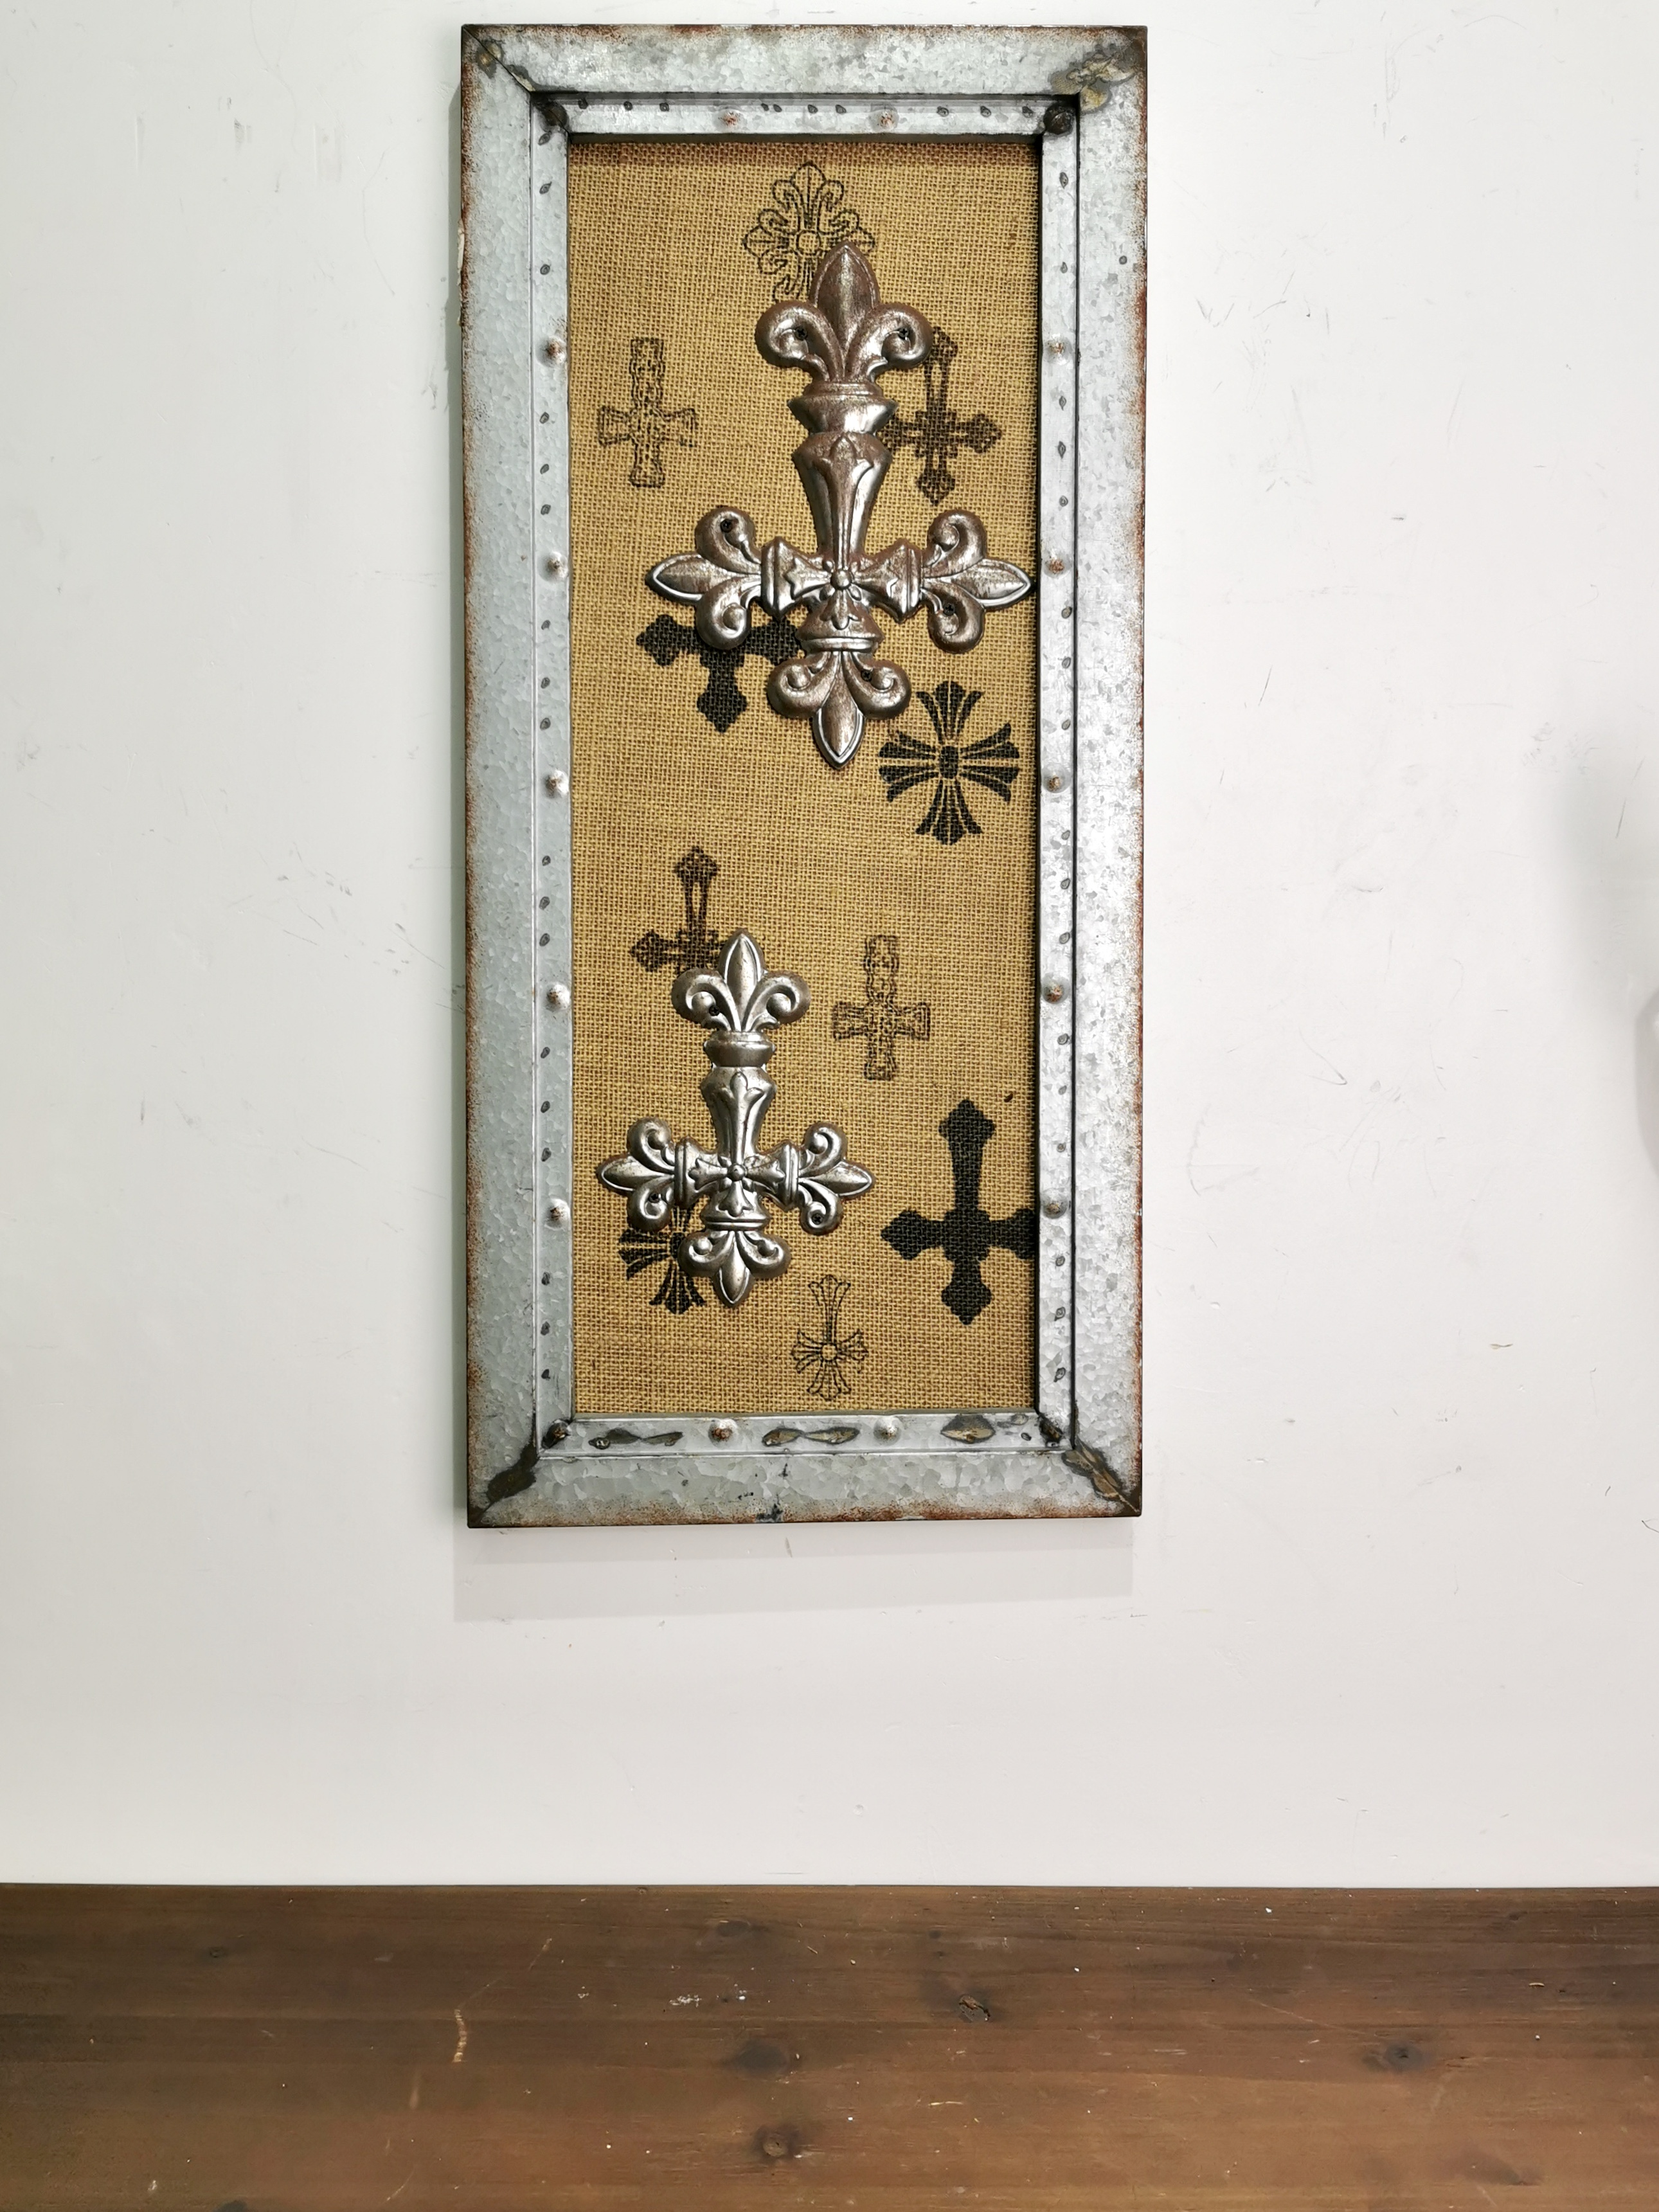 Vintage Metal Wall Decor - Home Decor, Gift Ideas